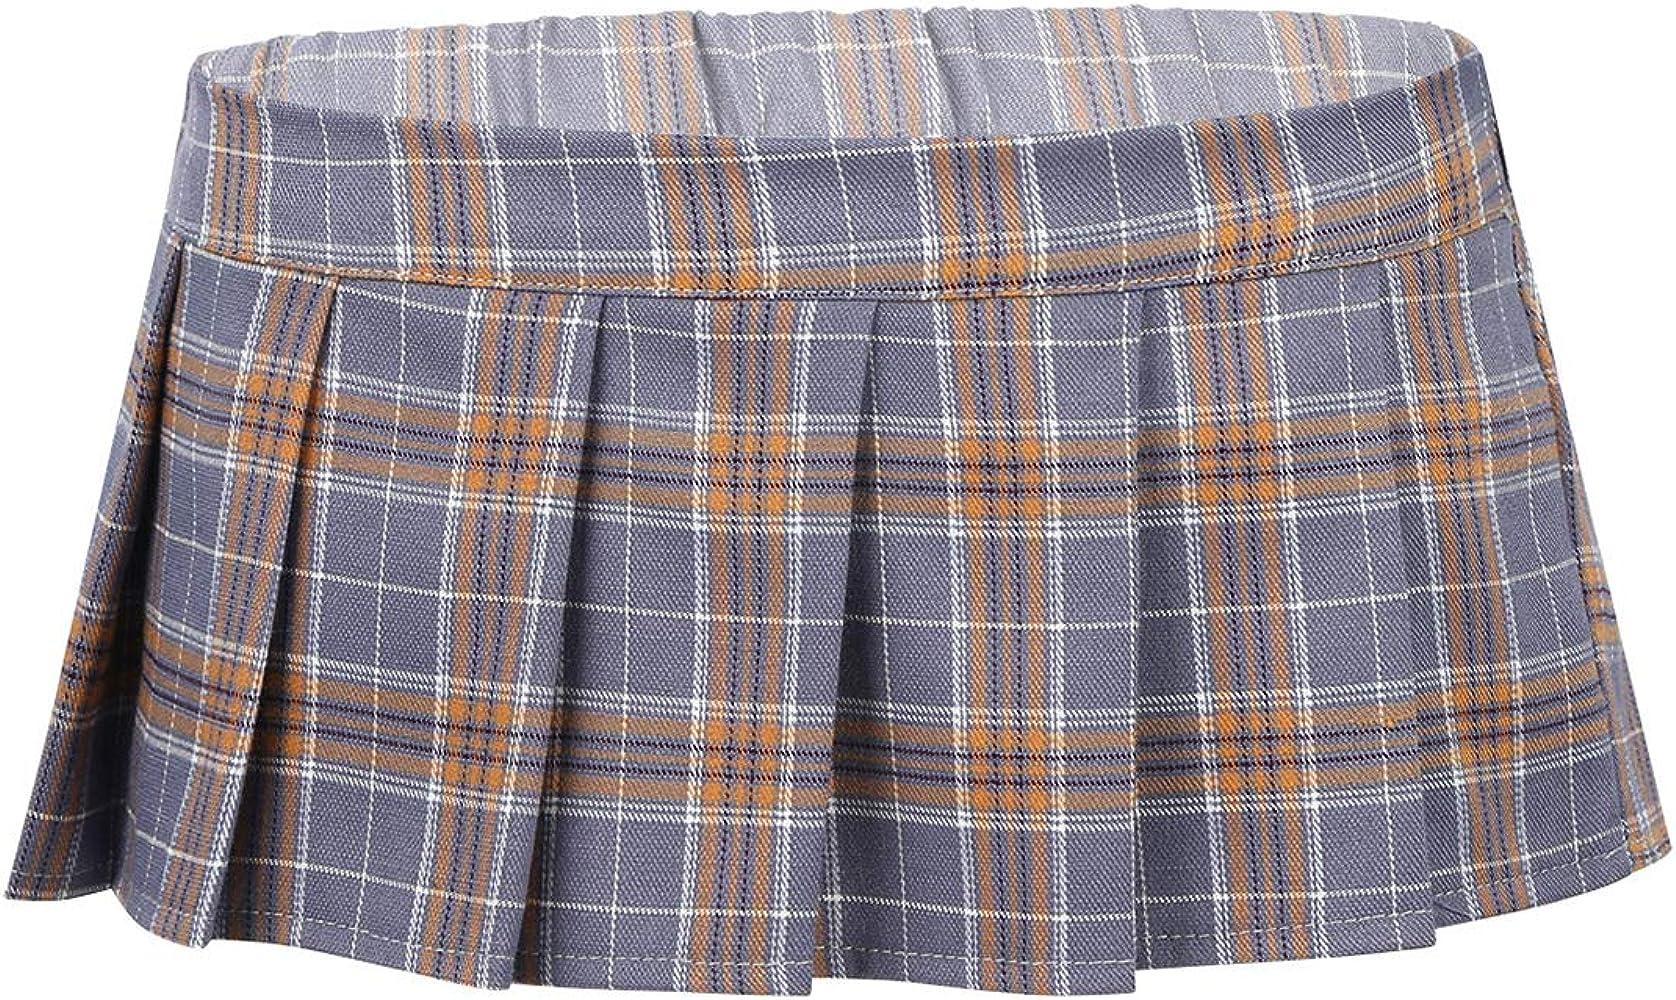 CHICTRY Mini Falda Plisada a Cuadros Mujer Sexy Uniforme Escolar ...